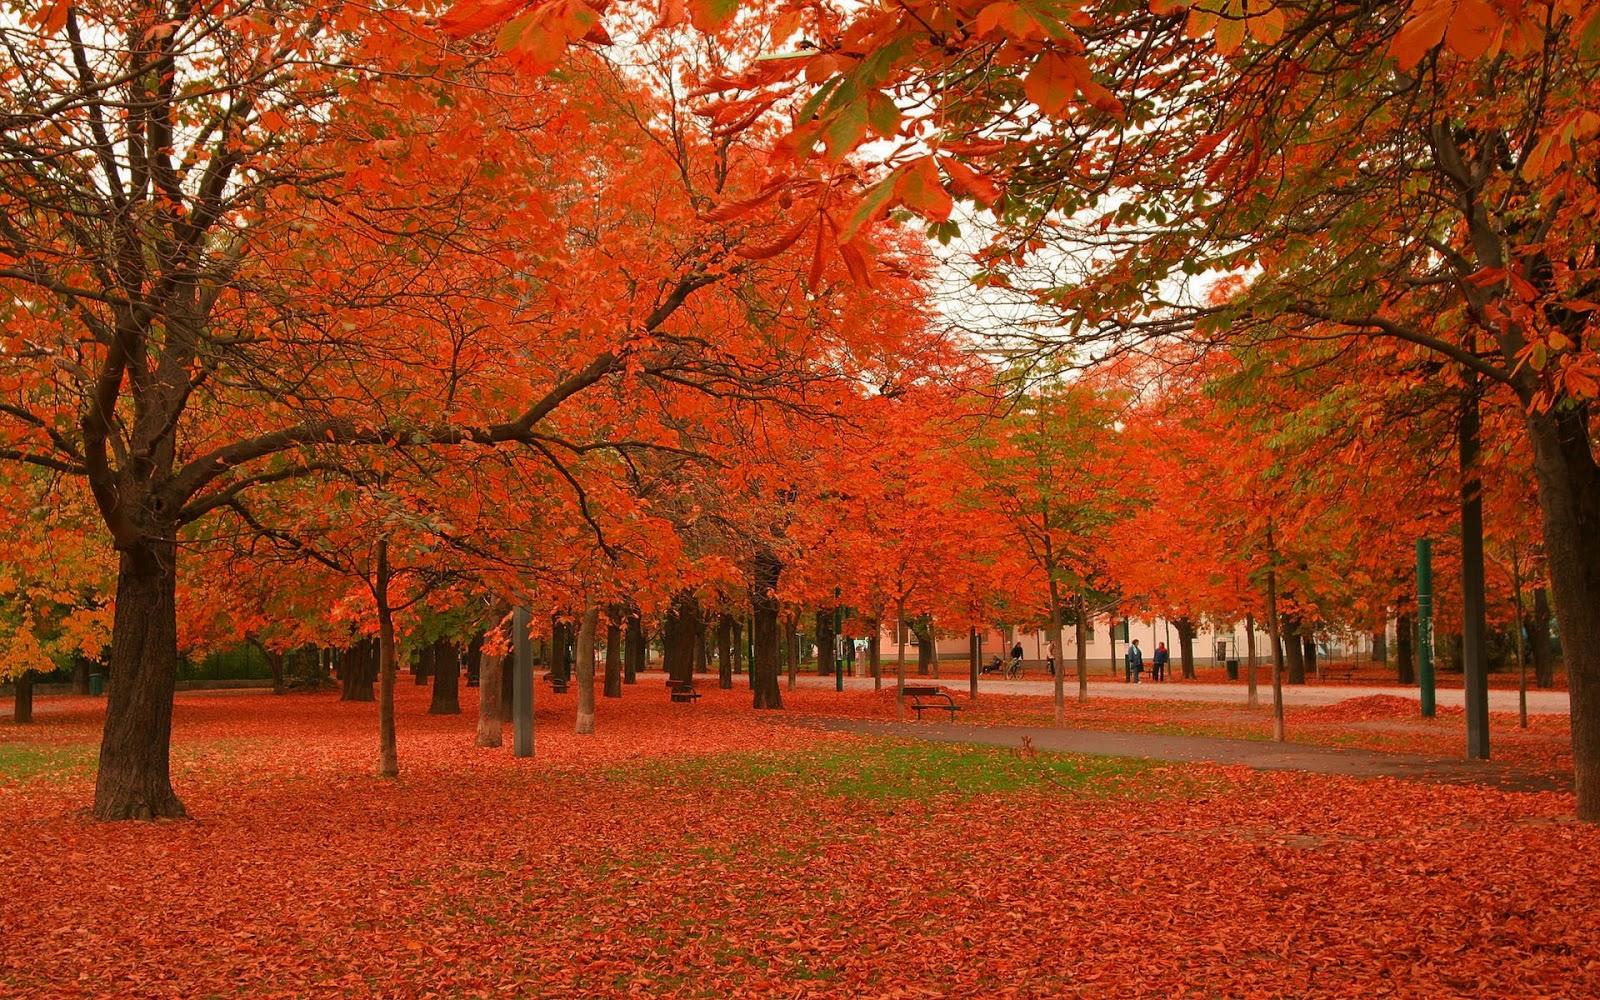 Desktop Wallpaper Pinterest Fall October Garden Amazing Admirable Seasonal Wallpapers For Desktop